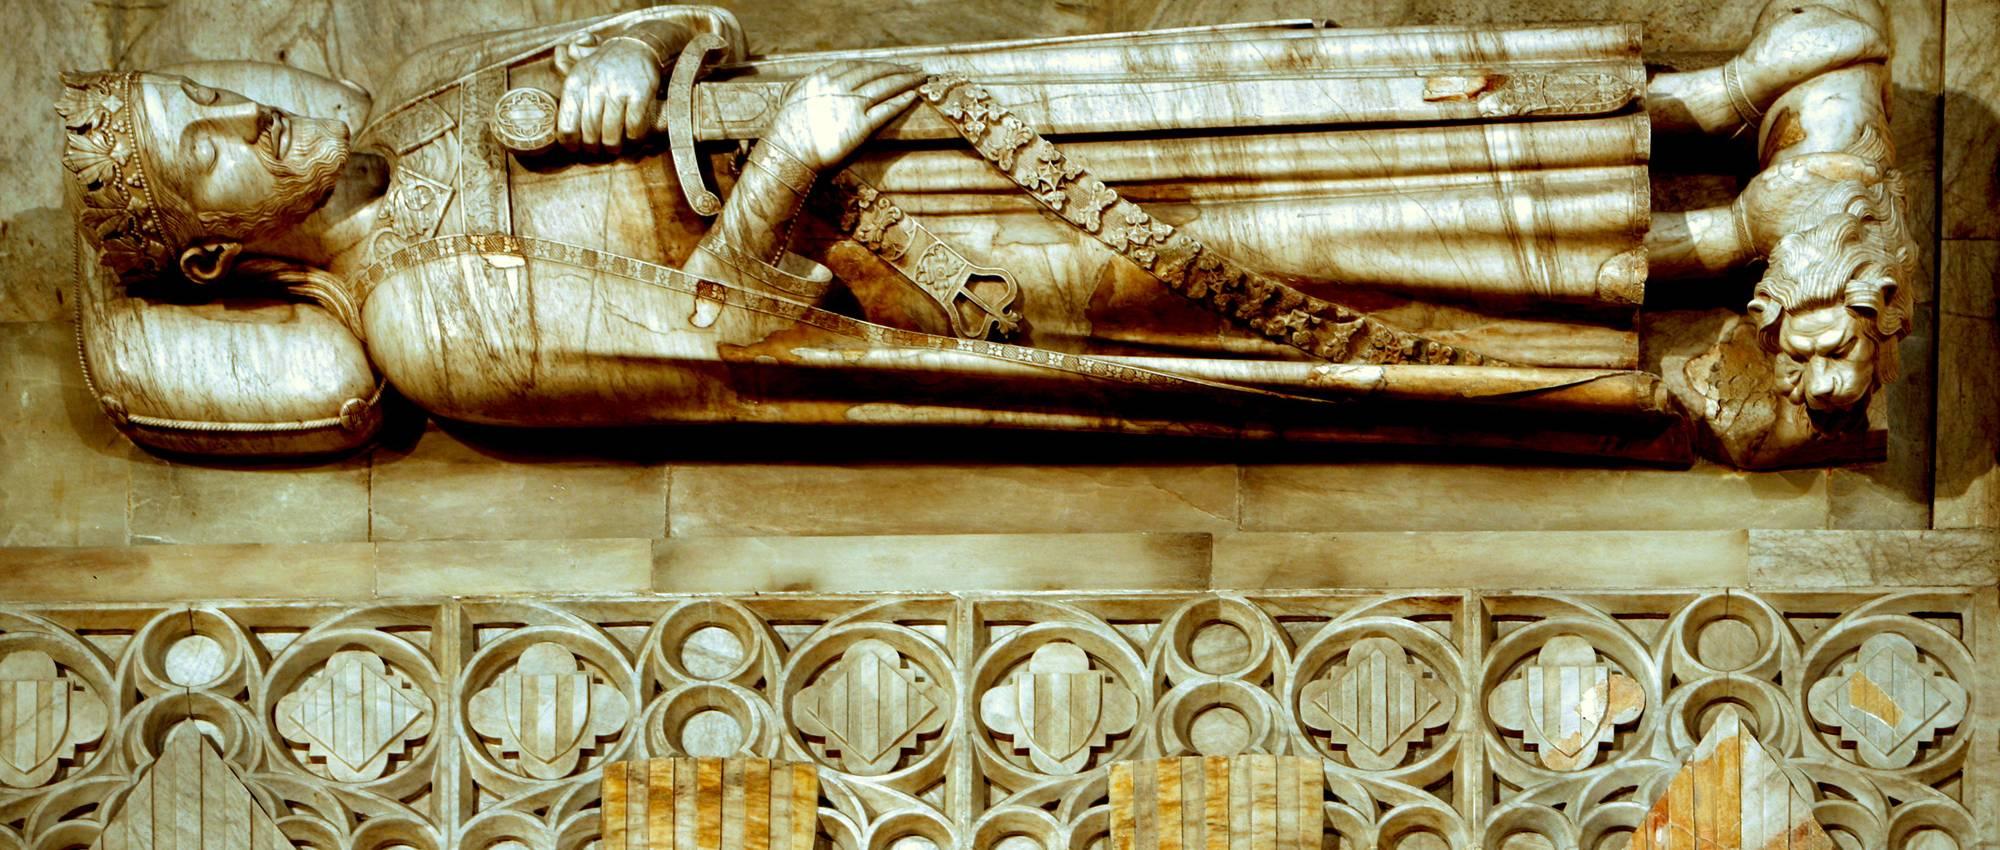 Detalles del monasterio. Josep Giribet / DGPC